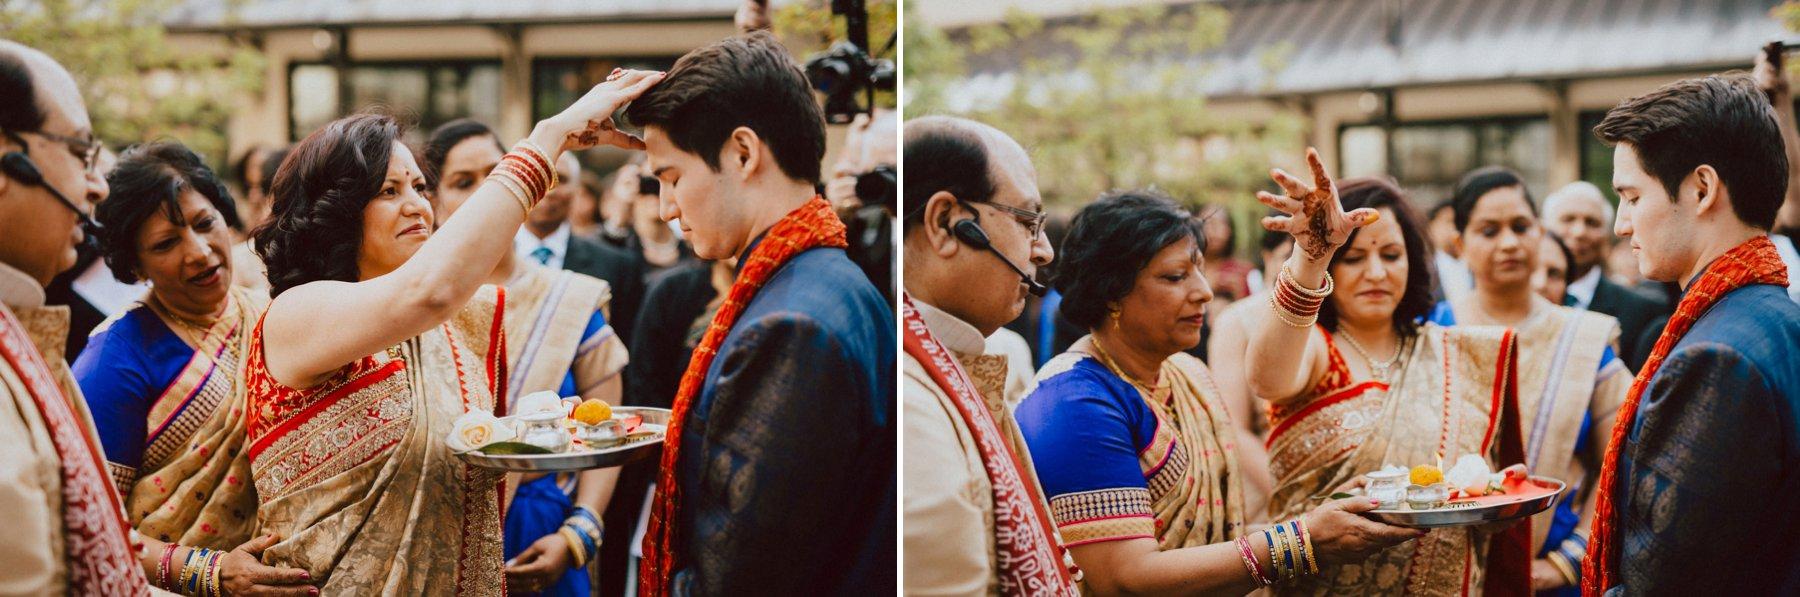 vie-philadelphia-indian-wedding-63.jpg